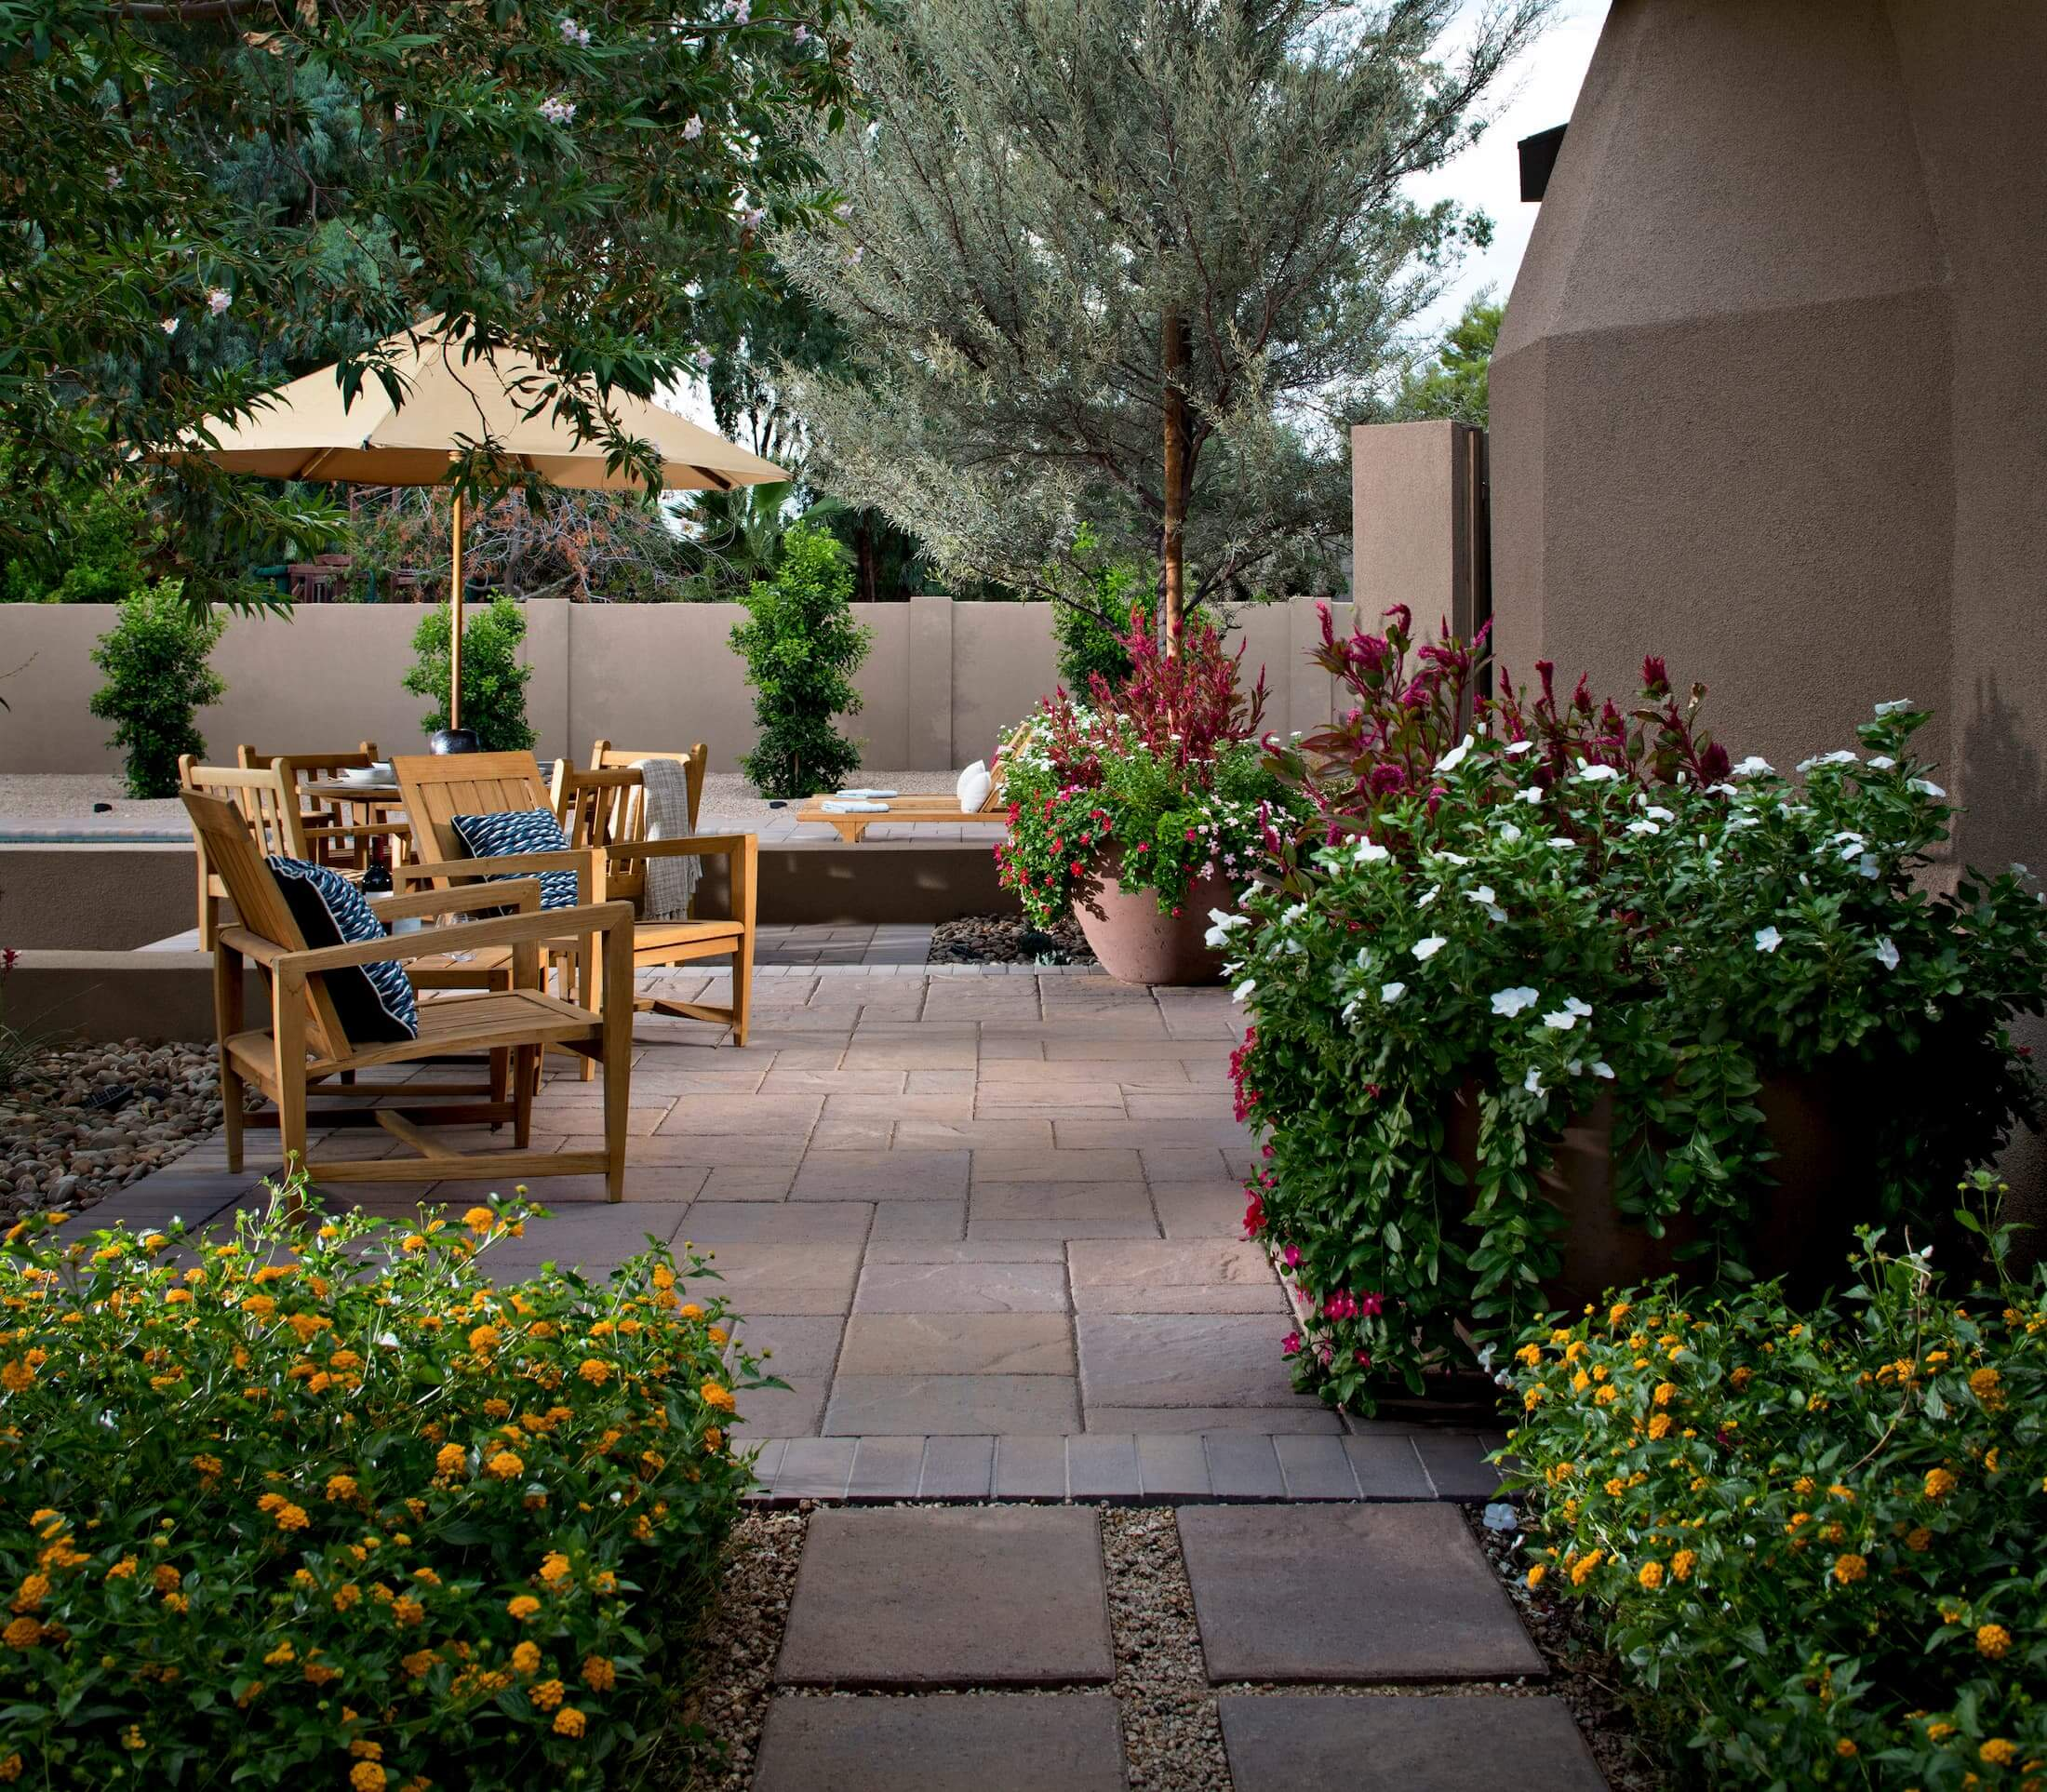 patio design ideas for your backyard